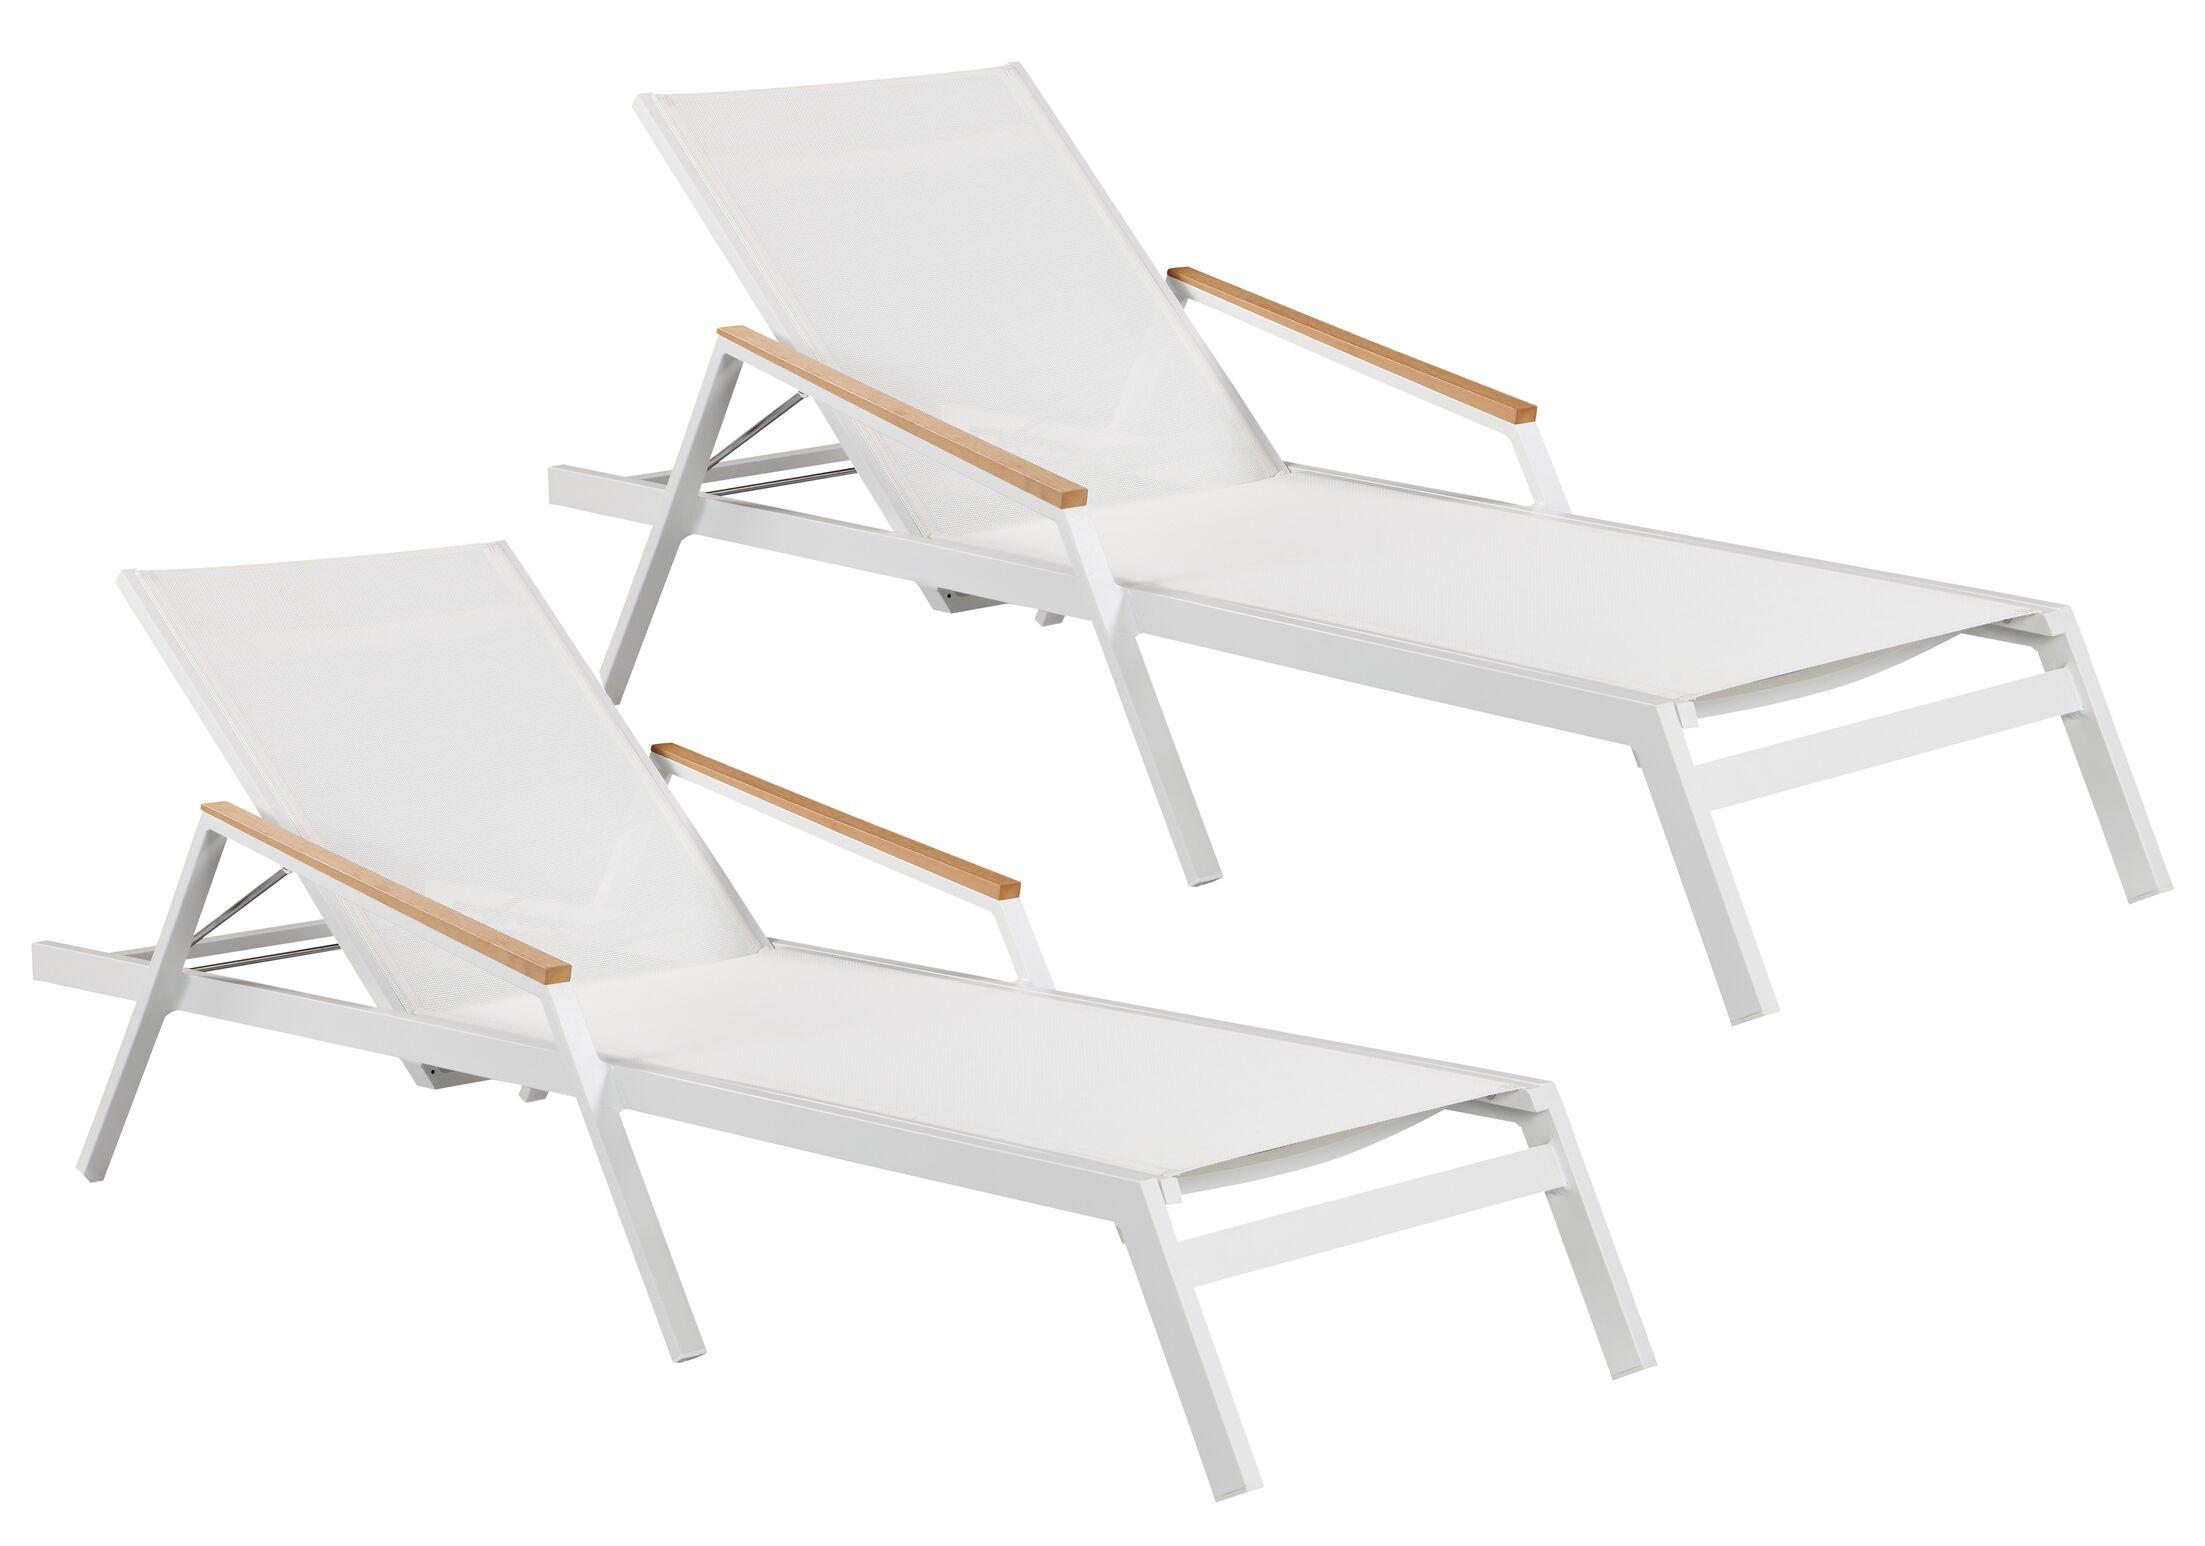 Skylar Lounger Chaise Lounge Set